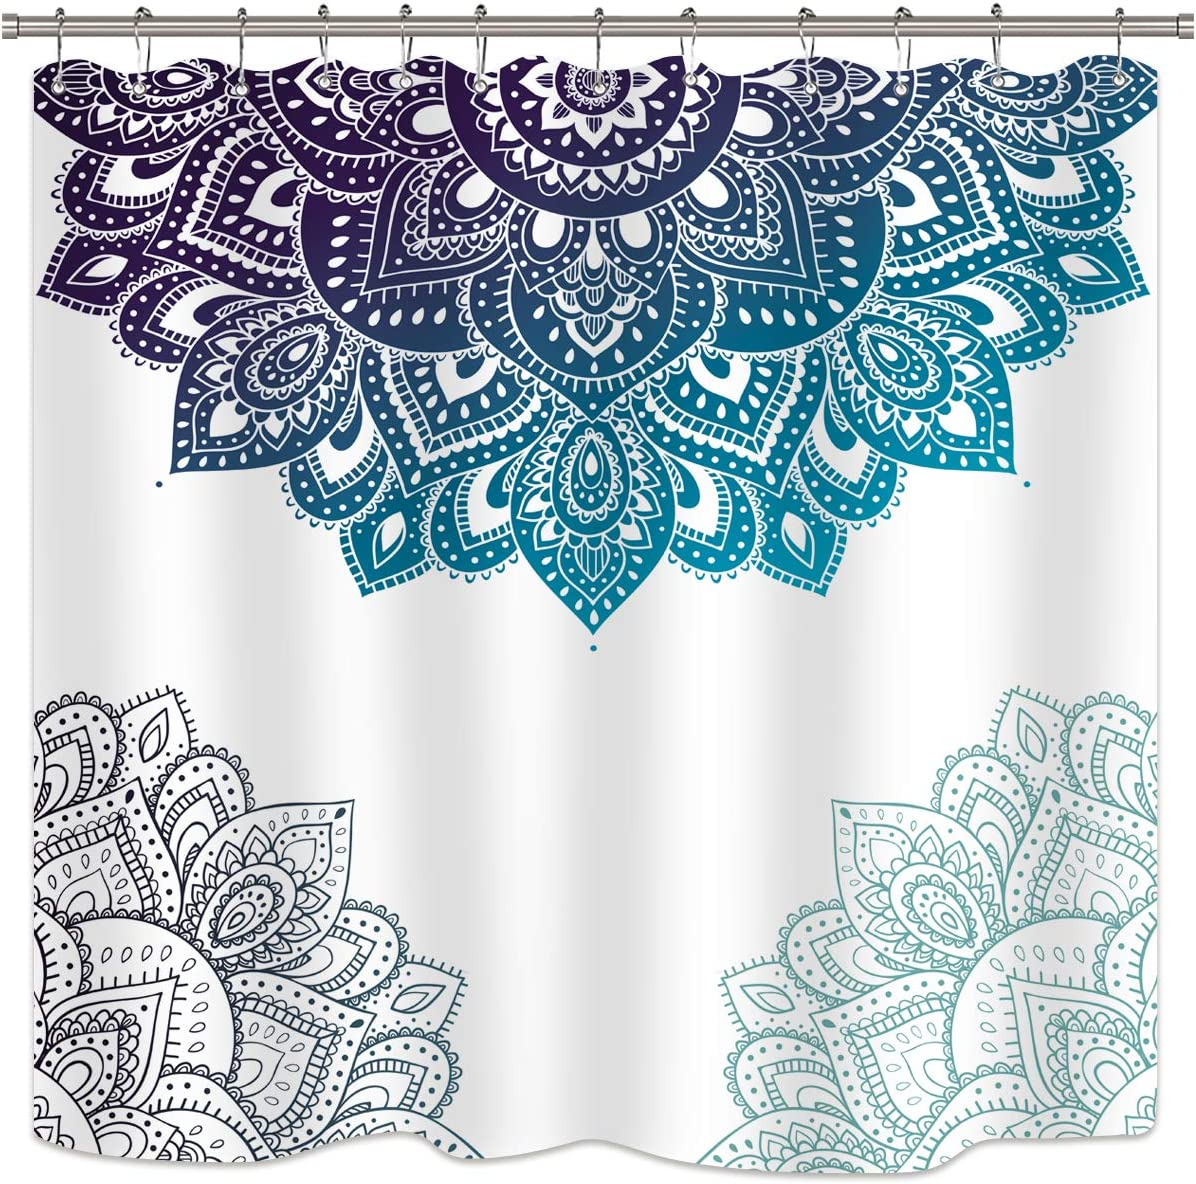 Riyidecor Henna Mandala Shower Curtain Boho Paisley India Bohemia Ombre Blue Flower Bathroom Decor Fabric for Bathtub 72Wx72H Inch 12 Pack Plastic Shower Hooks Included